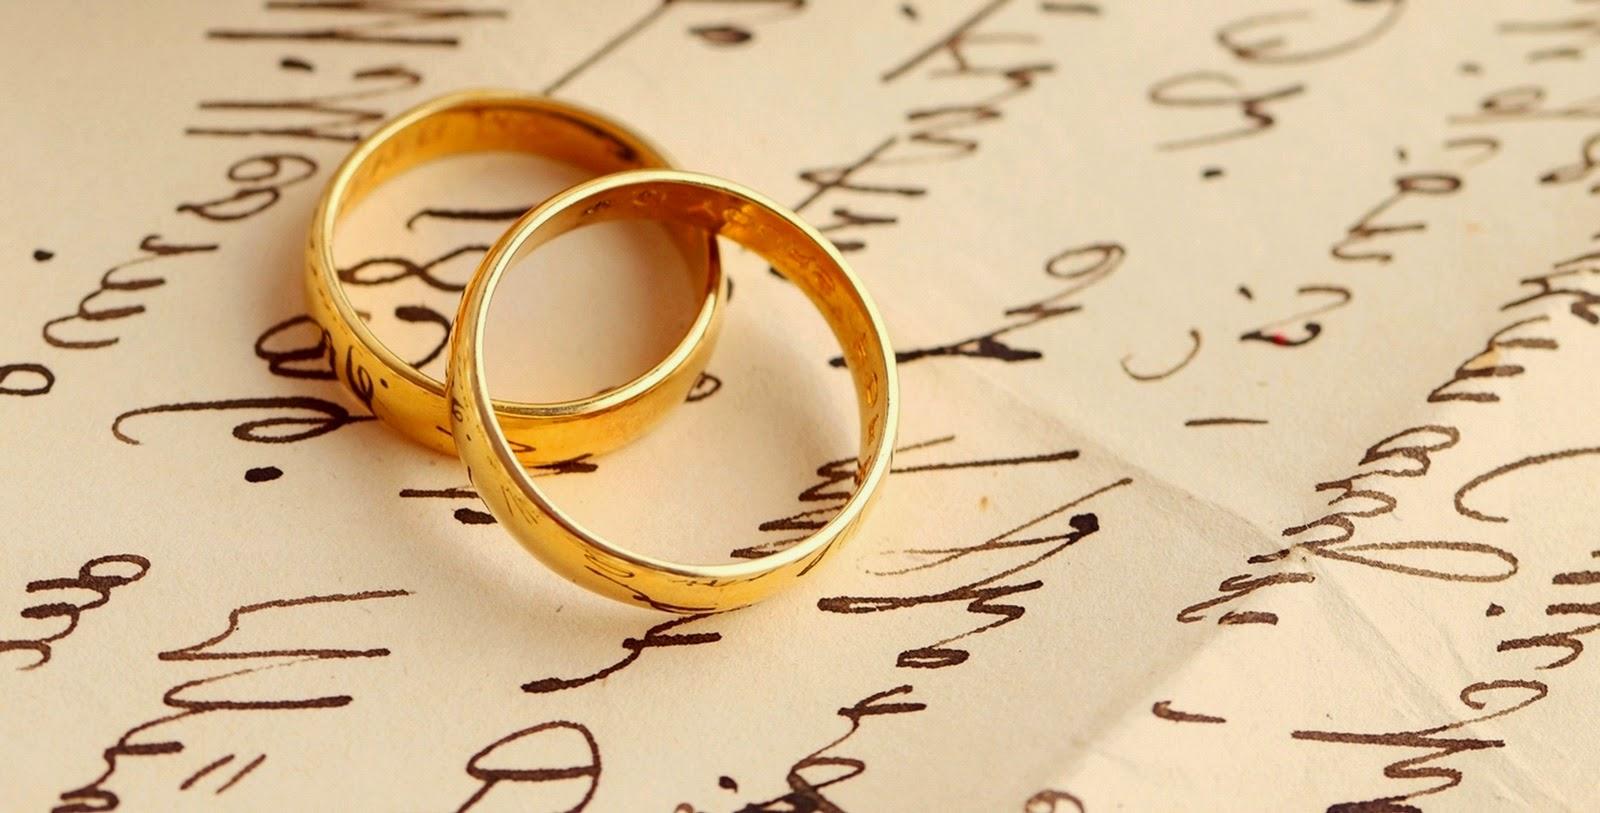 Matrimonio Entre Hermanos Biblia : Matrimonio para cristo curiosidades anillo tradiciones